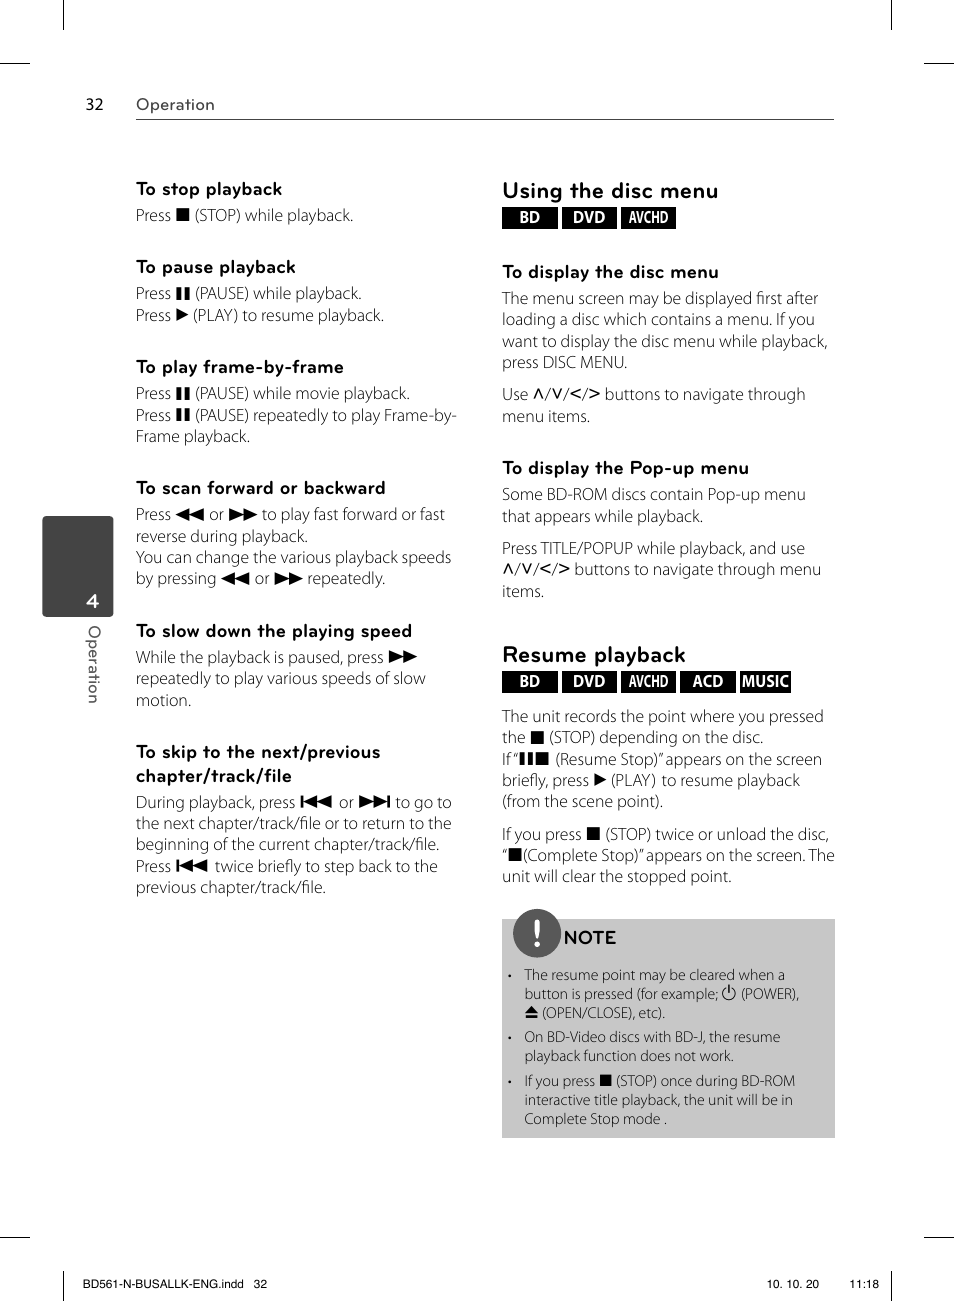 Using the disc menu, Resume playback | LG BD550 User Manual | Page ...